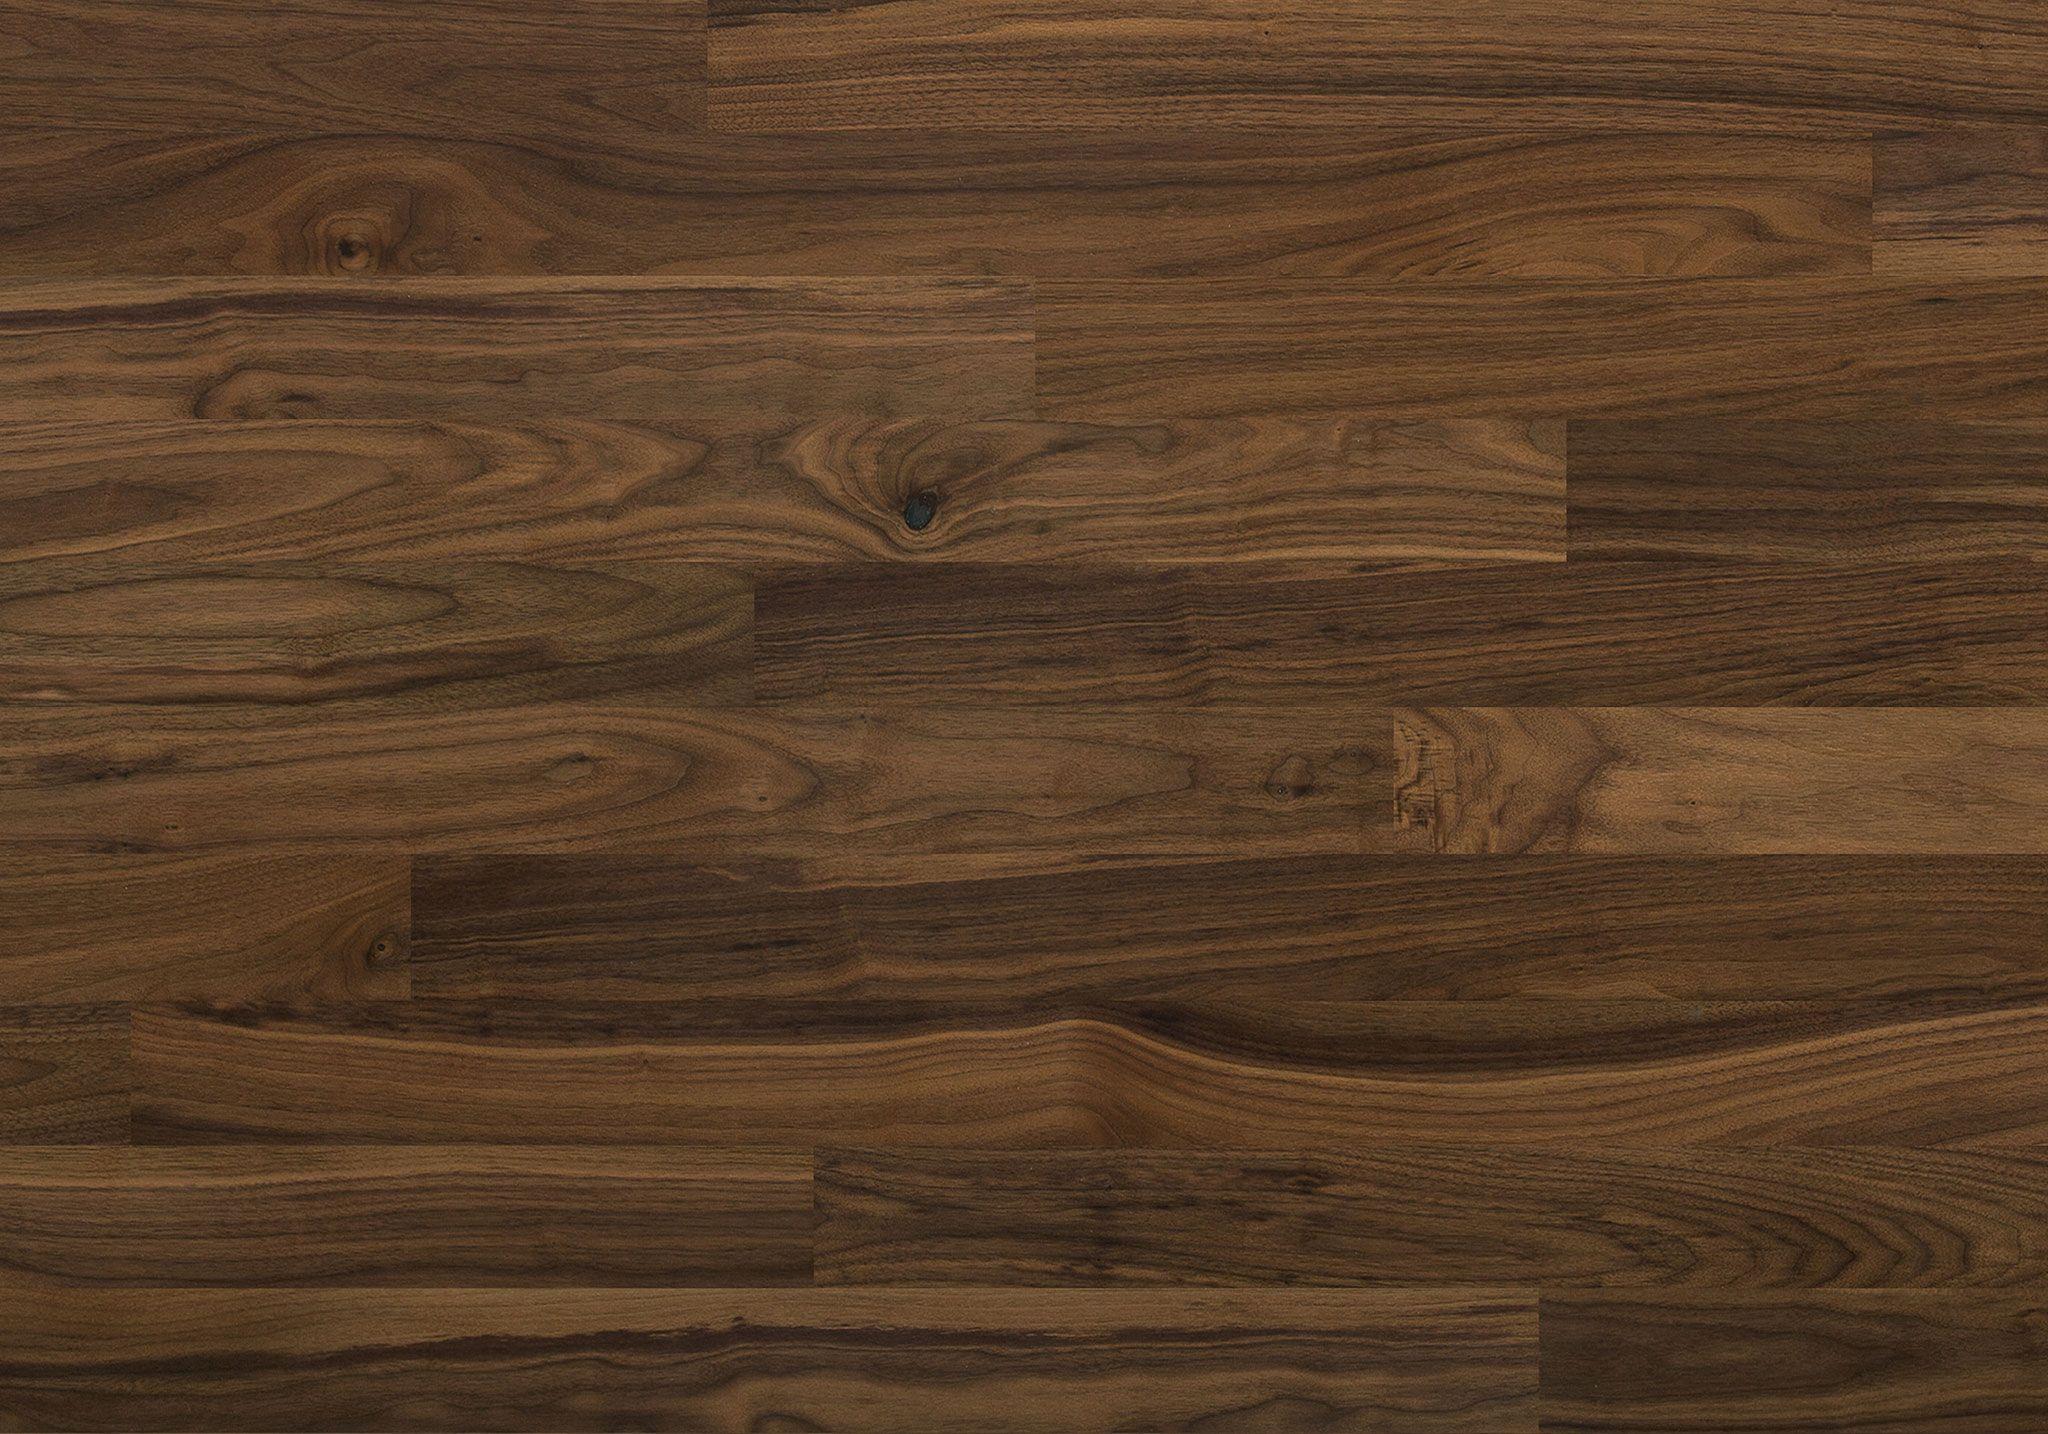 Natural Ambiance Black Walnut Exclusive Lauzon Hardwood